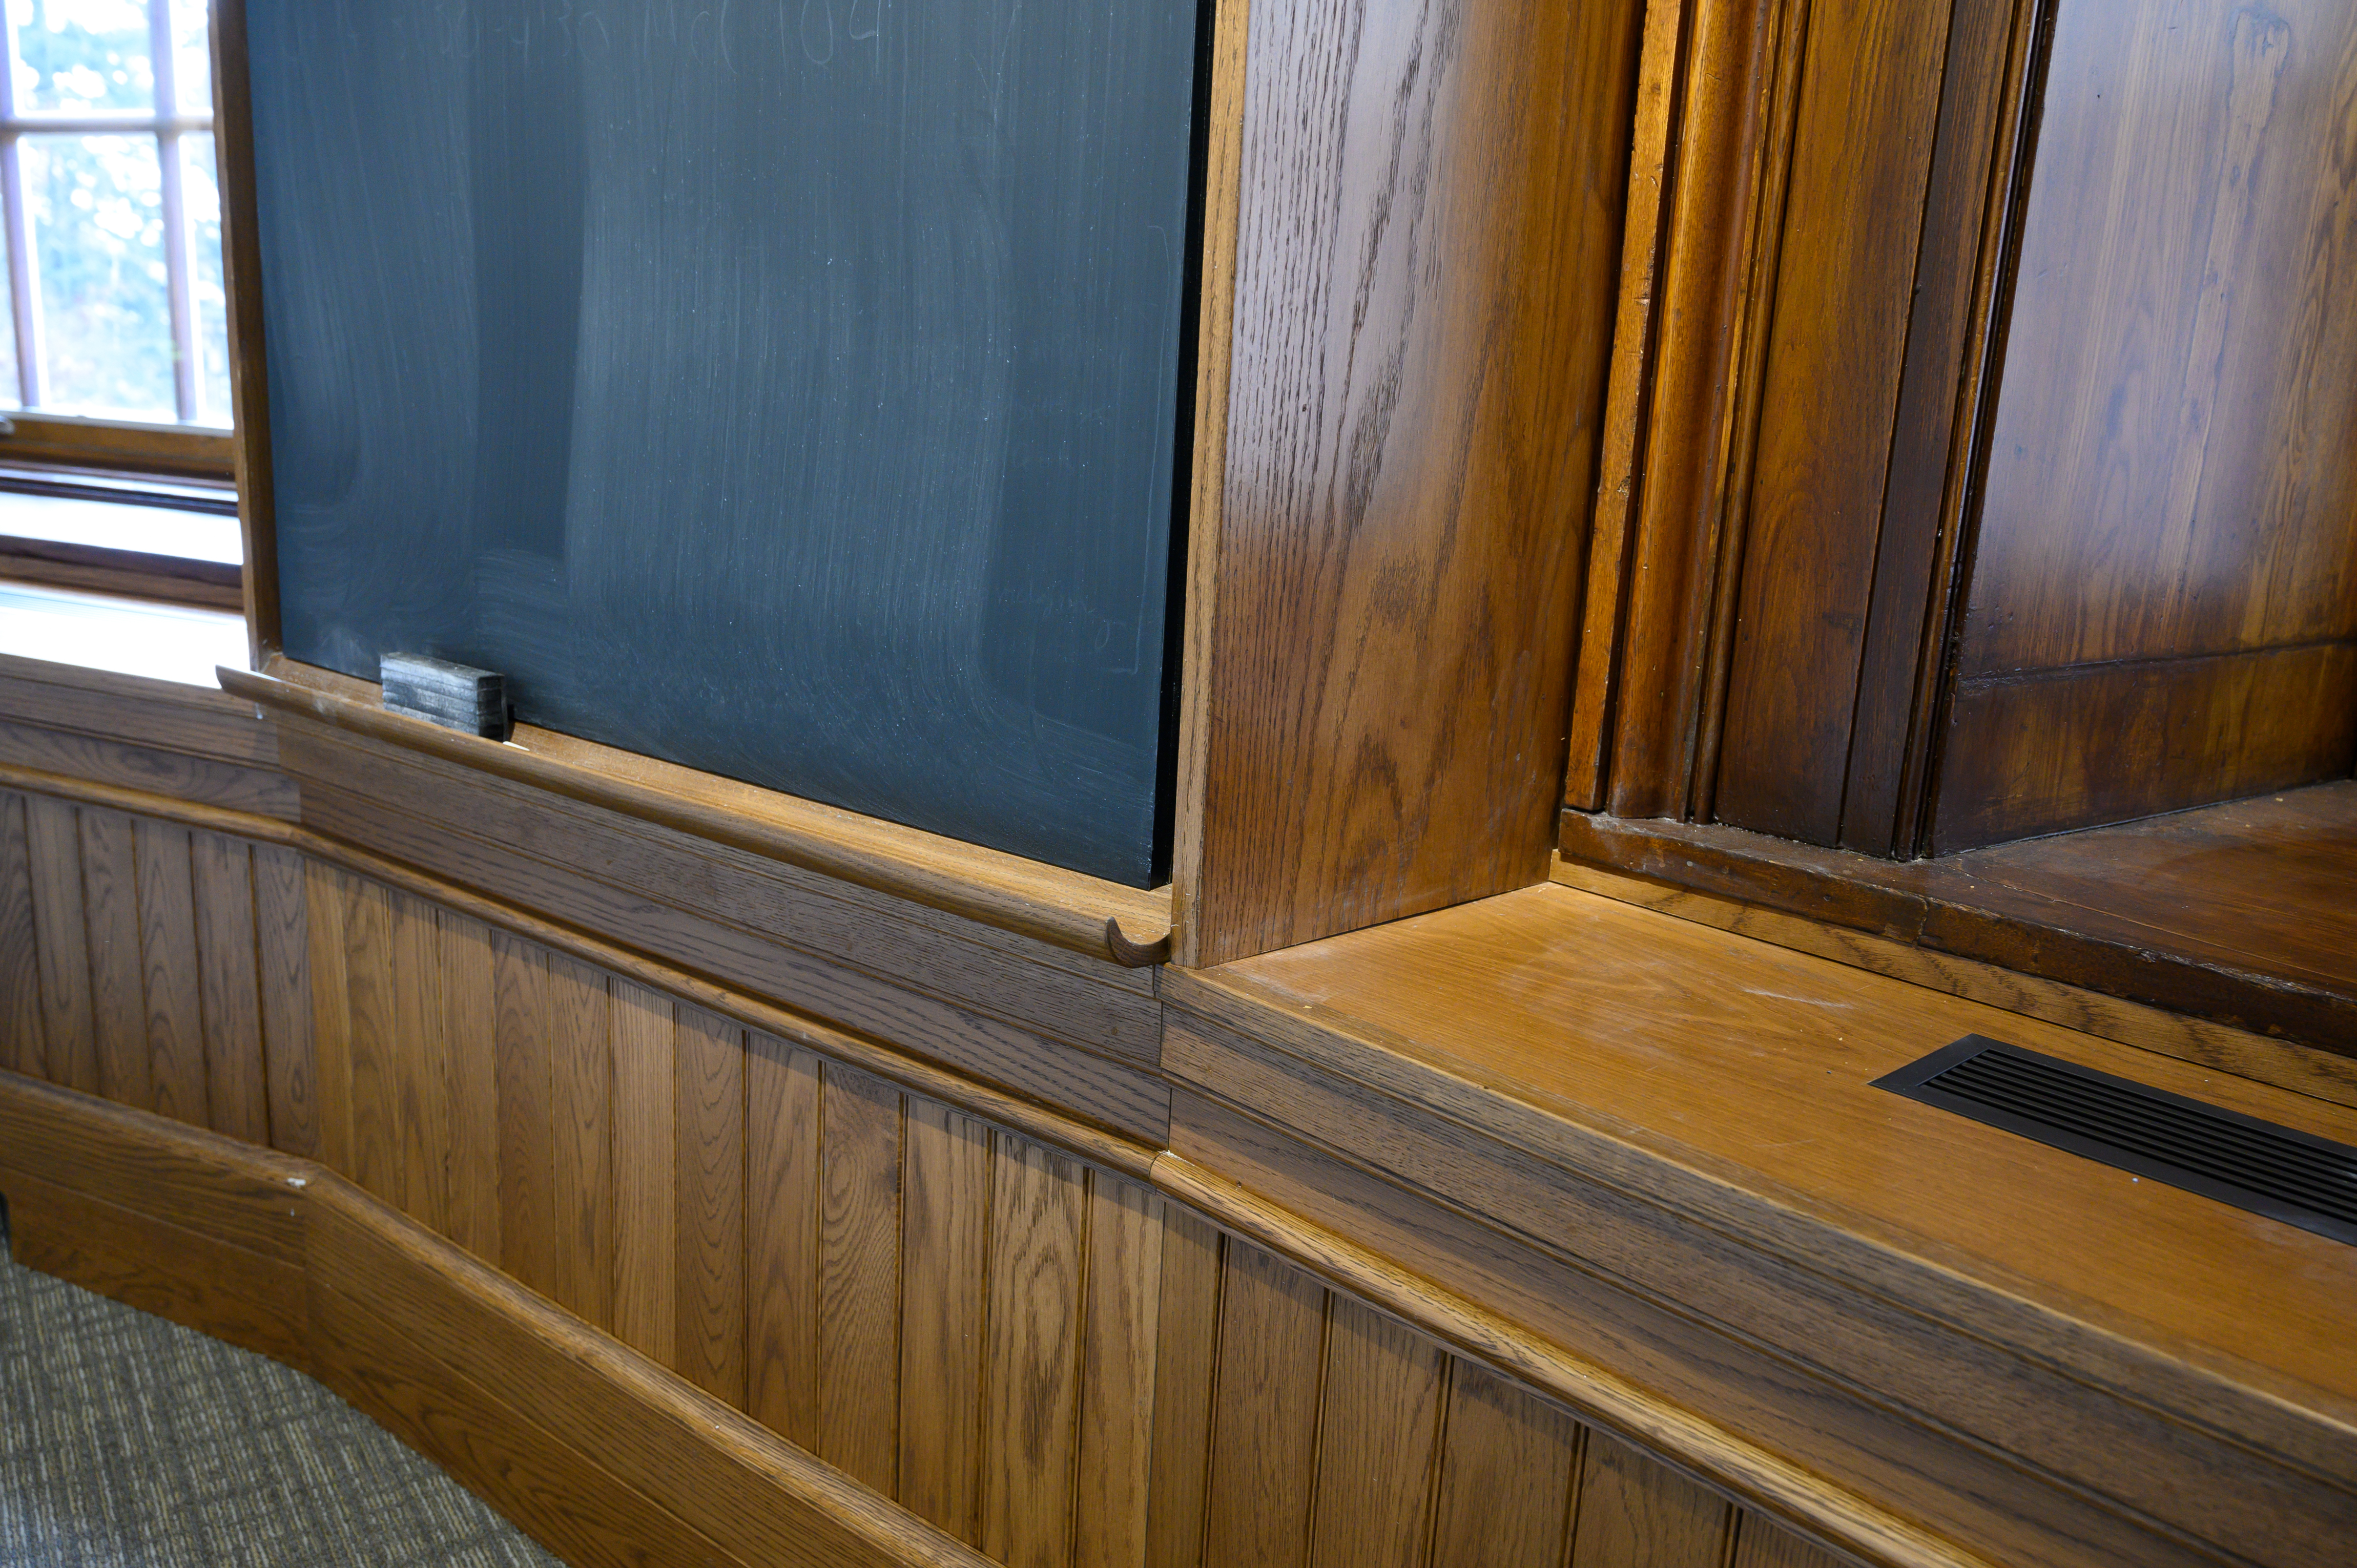 Smith_classroom_Seeley_106-34